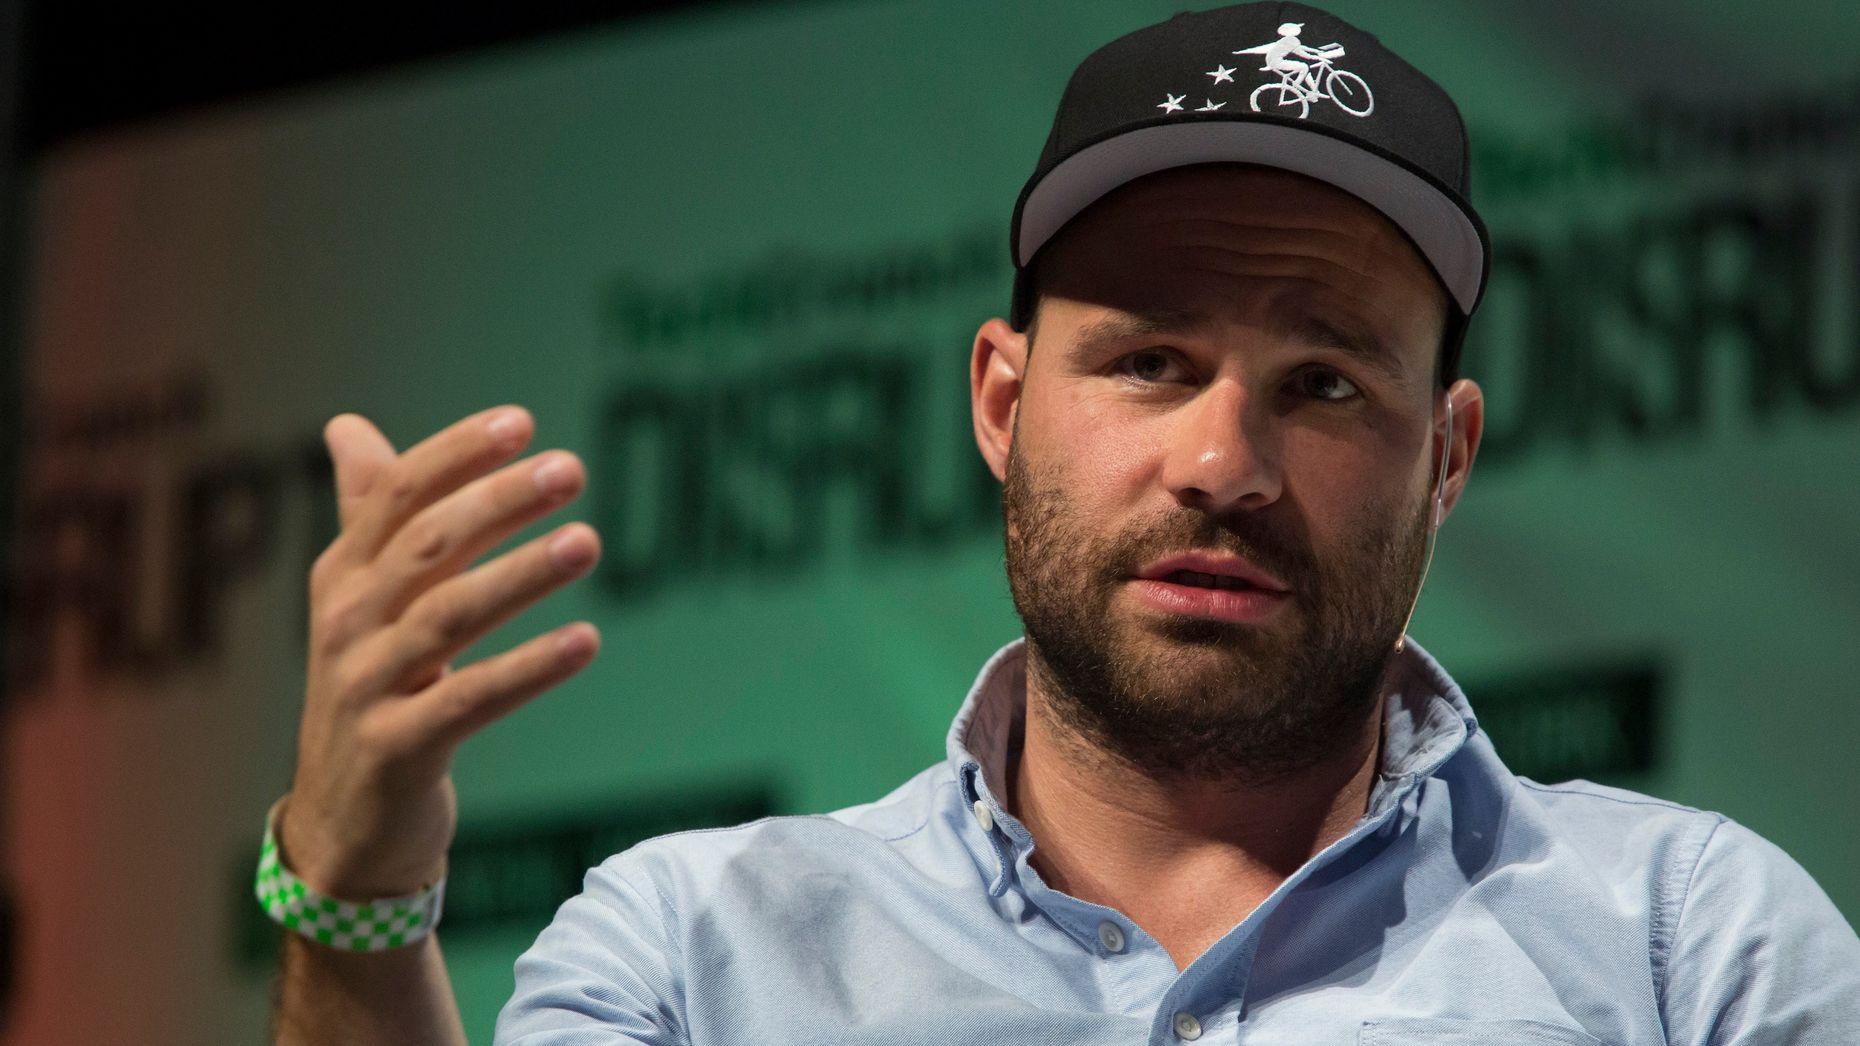 Postmates CEO Bastian Lehmann. Photo by Bloomberg.